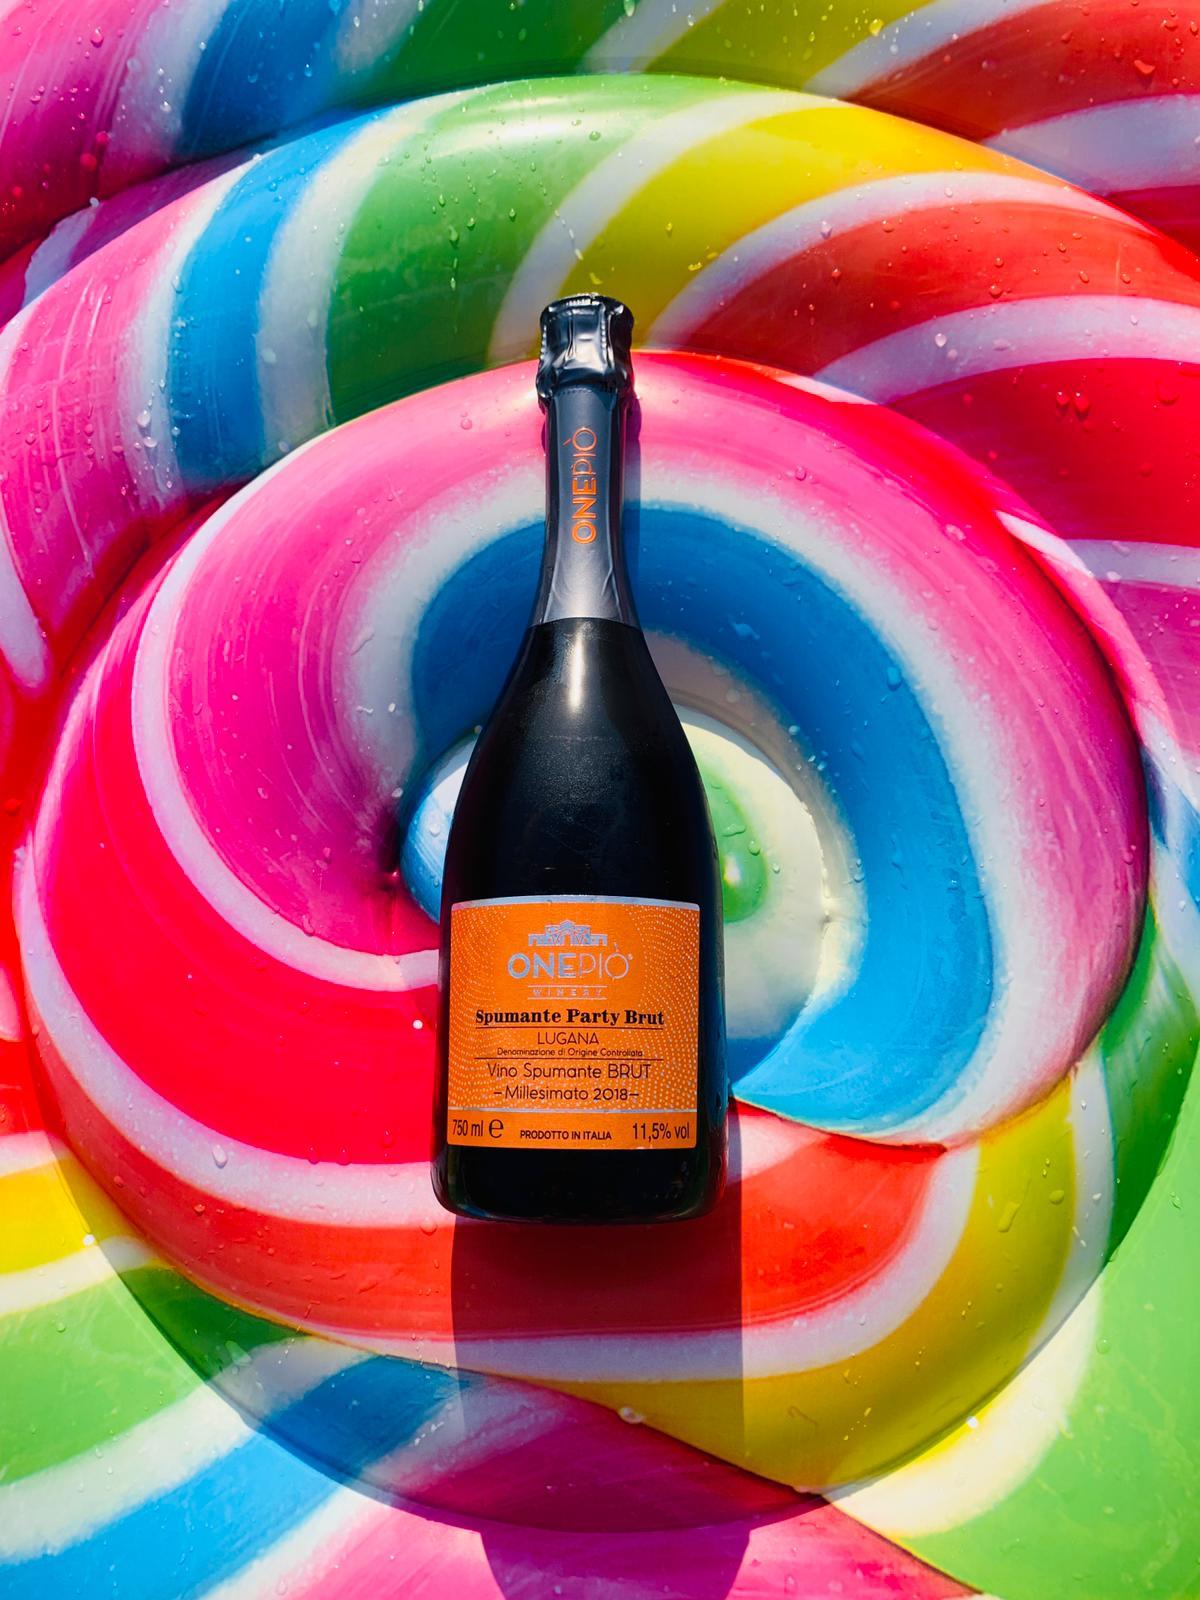 No Wine no Party! - You can find it at www.onepio.shop●●#onepio #onepiowinery #winery #partytime #summerparty #yellow #winelovers #workingteam #wineflower #whitewine #luganawine #lugana #gardalake #vino🍷 #sirmione #desenzano #vineyard #green #winetime #glassofwine #italianwine #ilariaaccordini #photographer